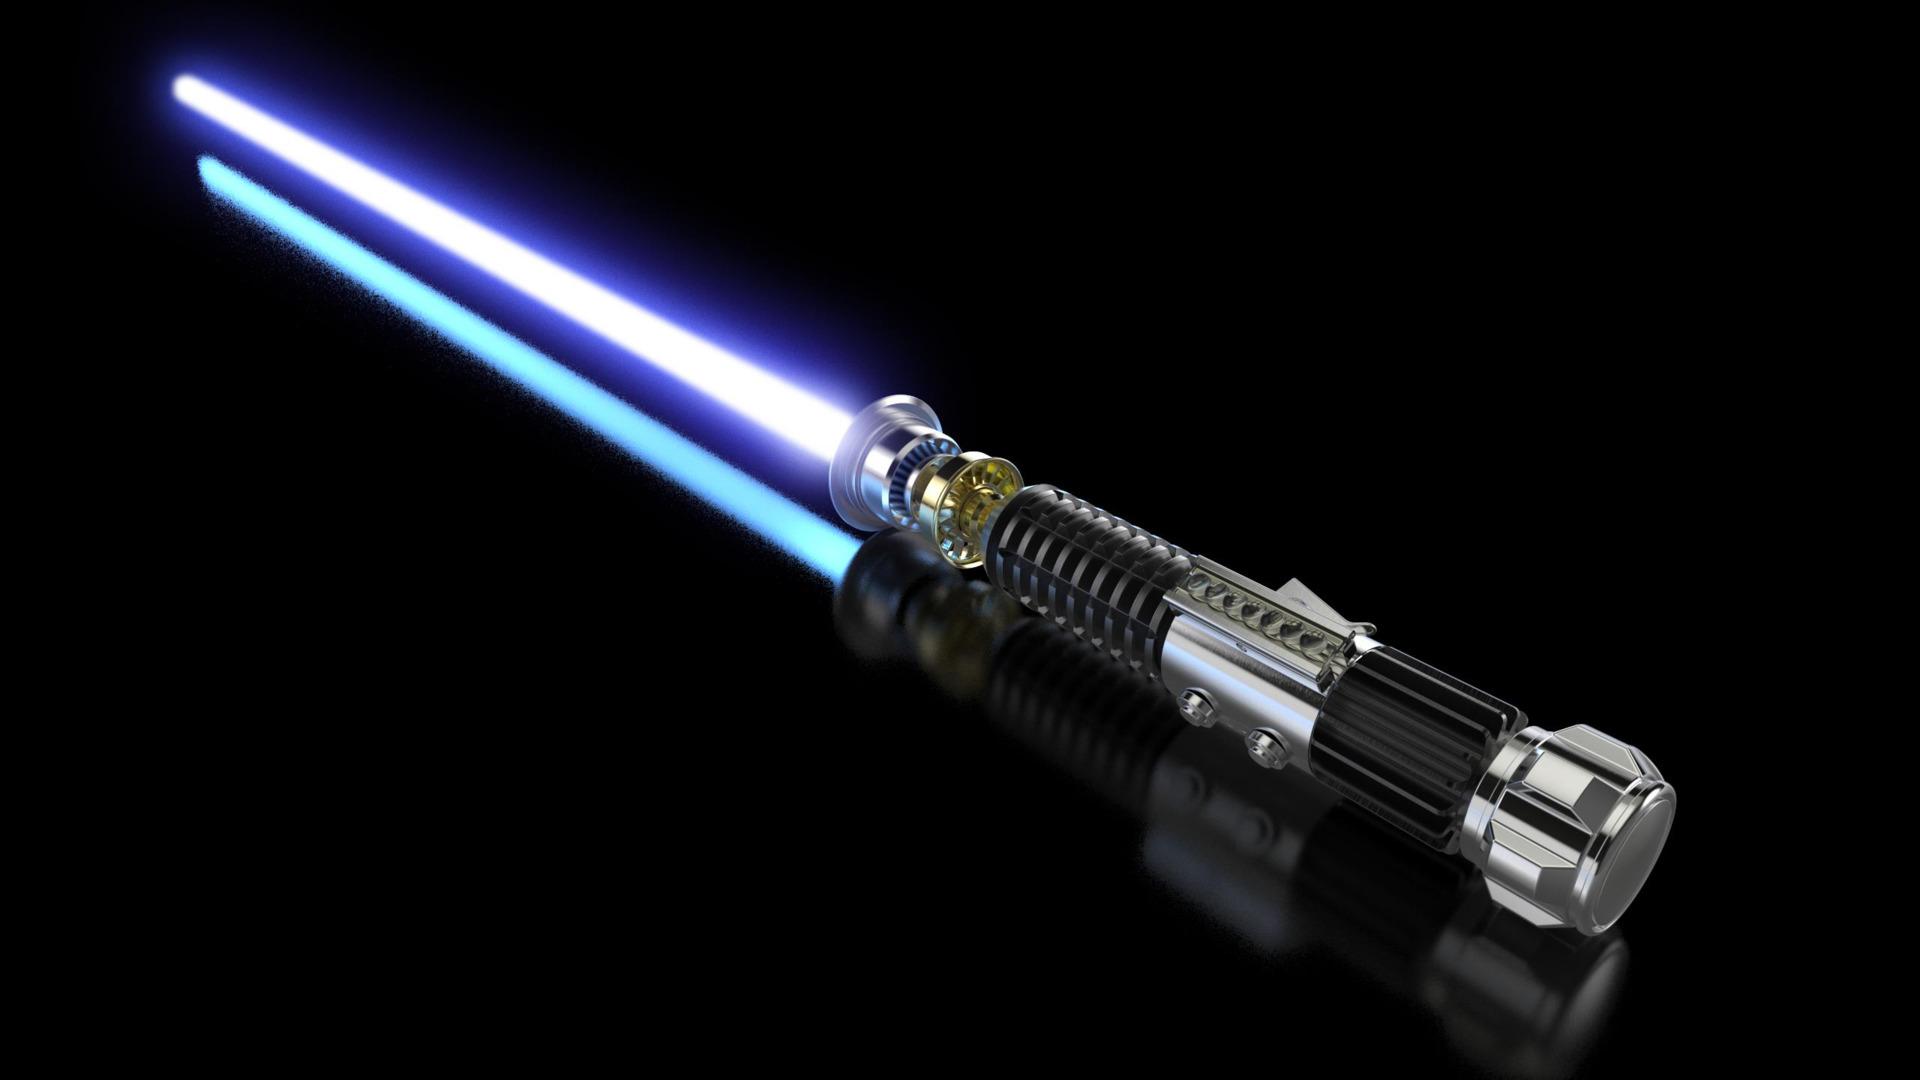 1920x1080 Lightsaber Star Wars Laptop Full HD 1080P HD 4k ...